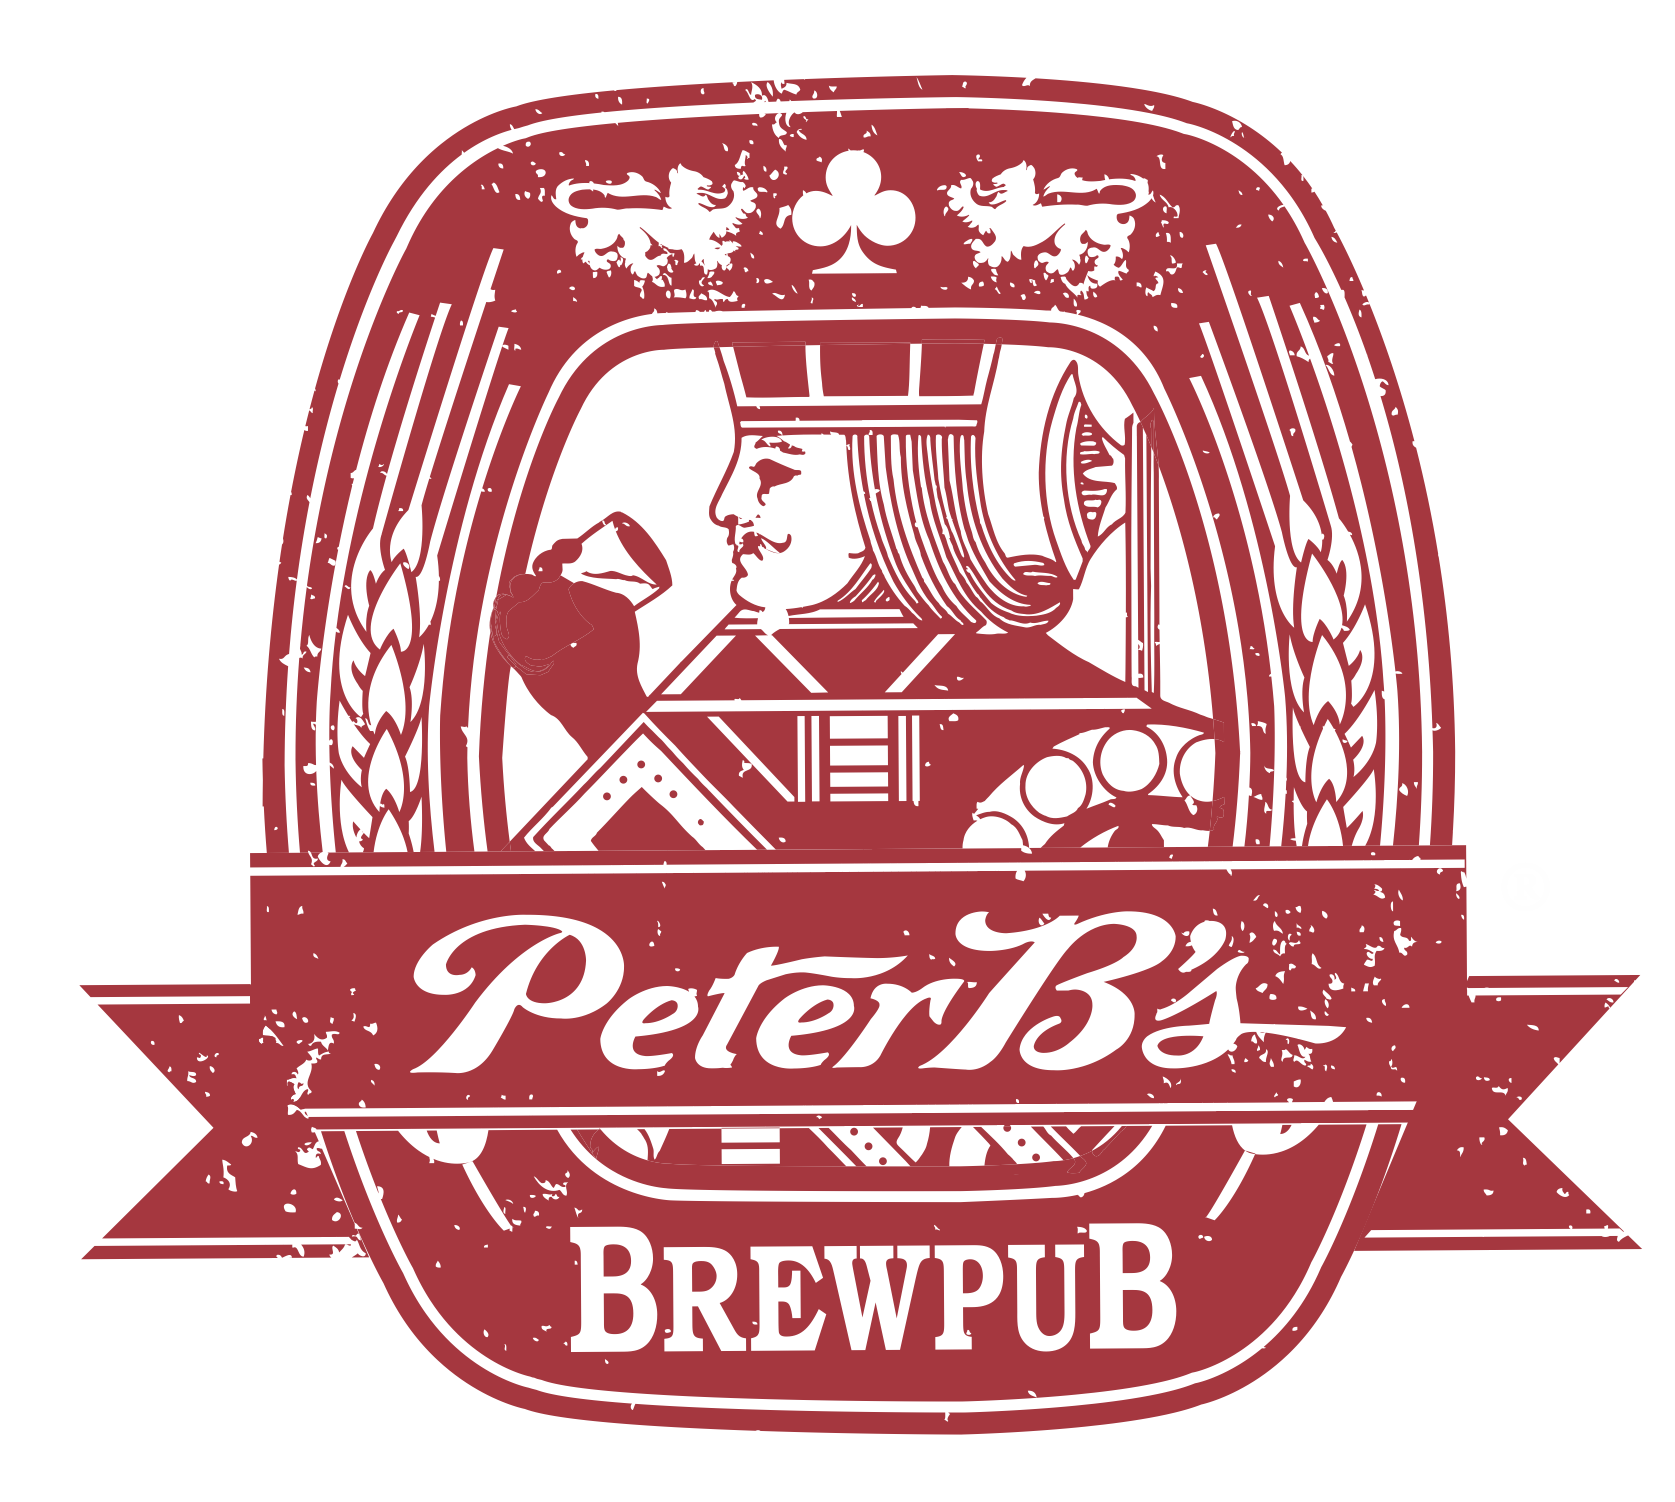 Copy of Peter B's Brewpub